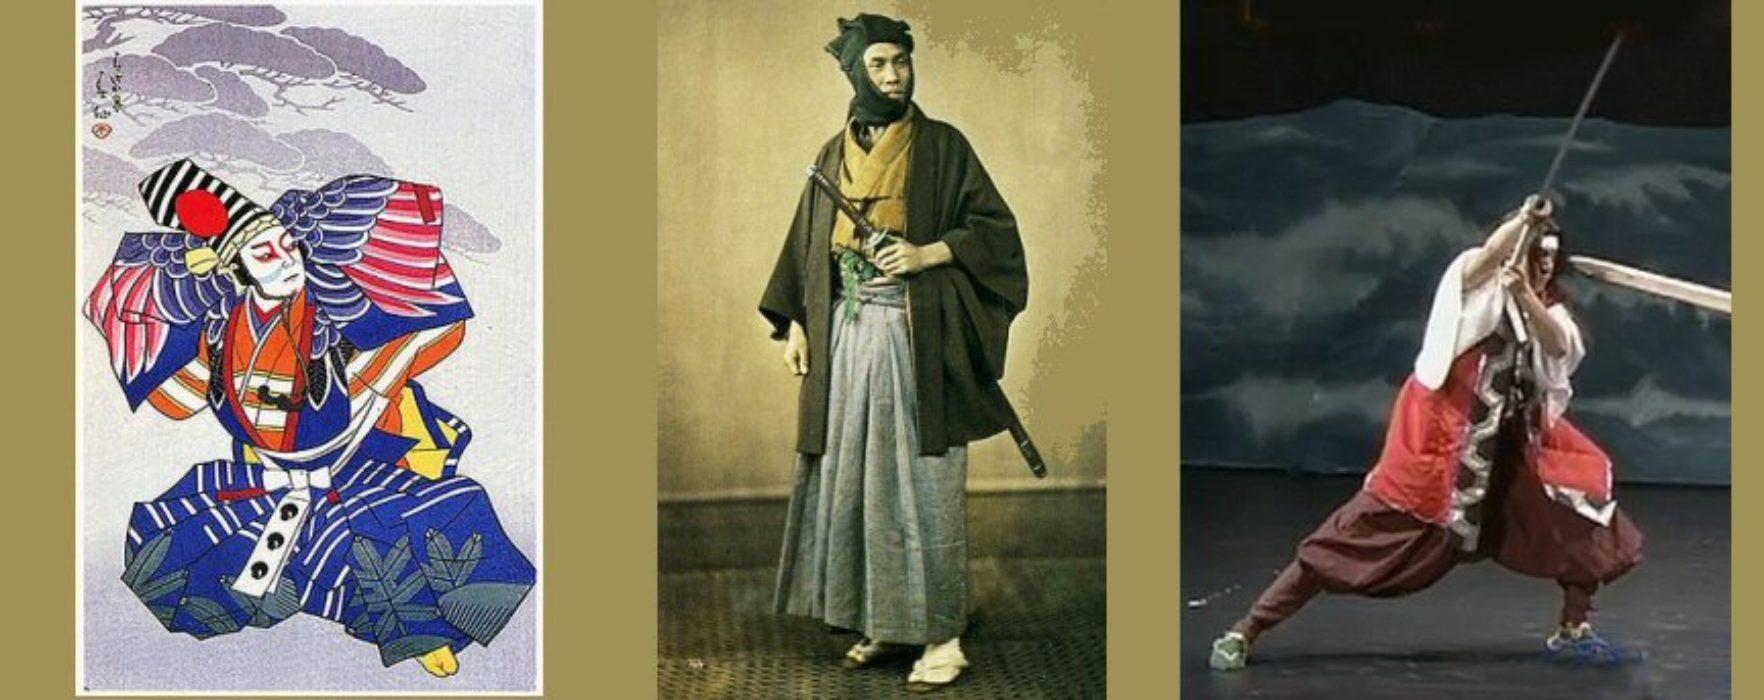 La hakama: tra storia e cronaca